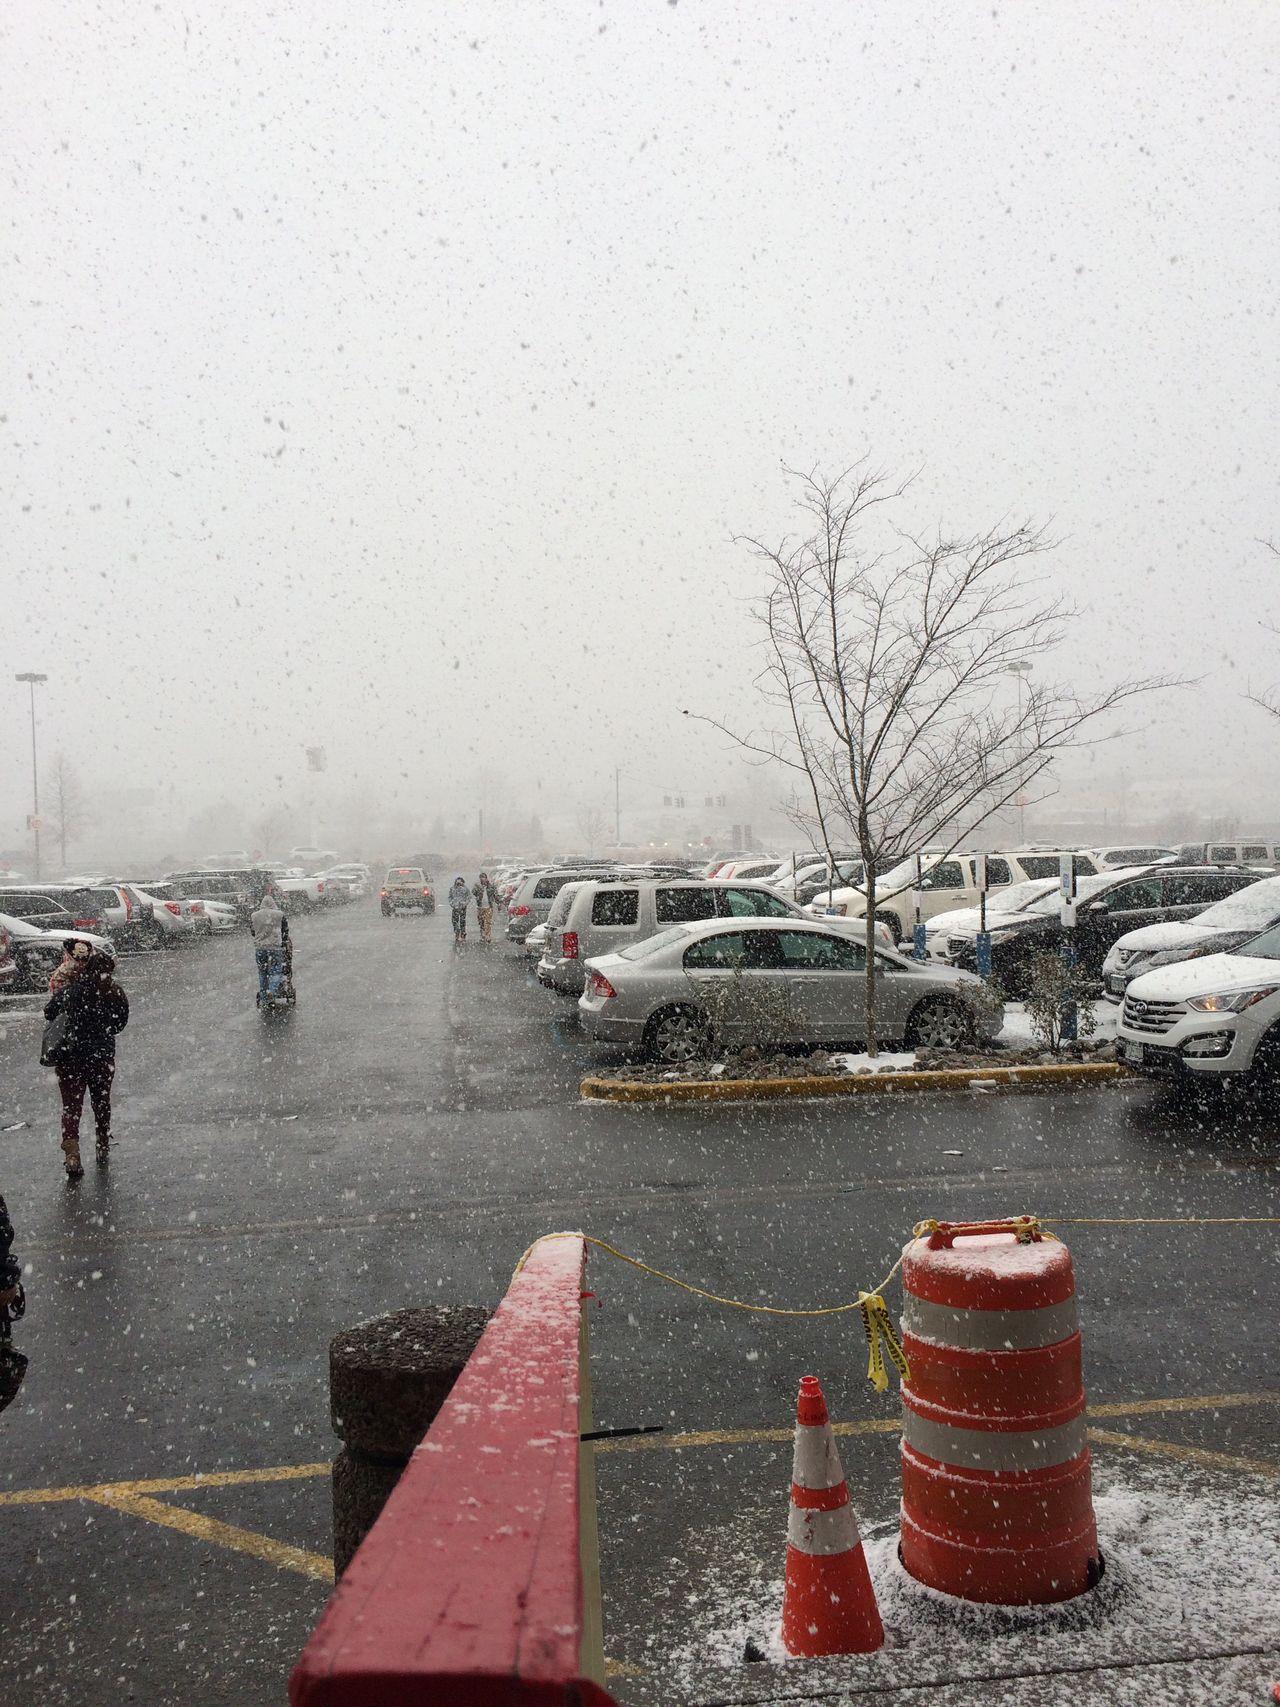 Palisades Centre, New Nyack. Palisades Centre Palisades New Nyack New York New York City Outdoors Fall Tree Snow Season  Sky Clouds Overcast